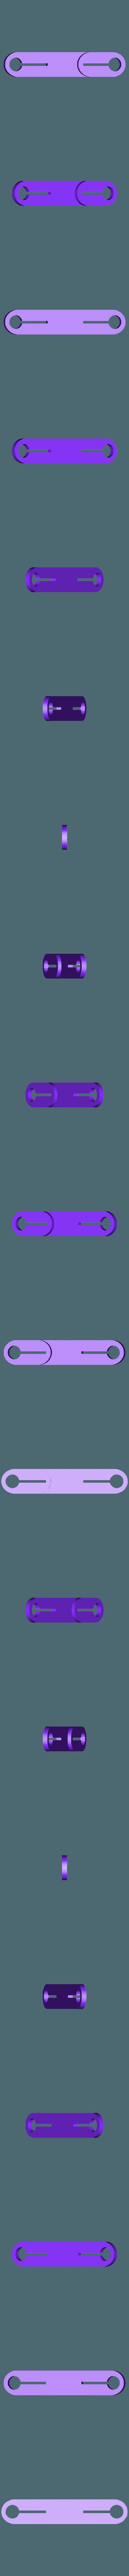 5cm_Strap_Holes.stl Download free STL file Flexible Filament Bikini Top and Bottom • 3D printable design, SexyCyborg